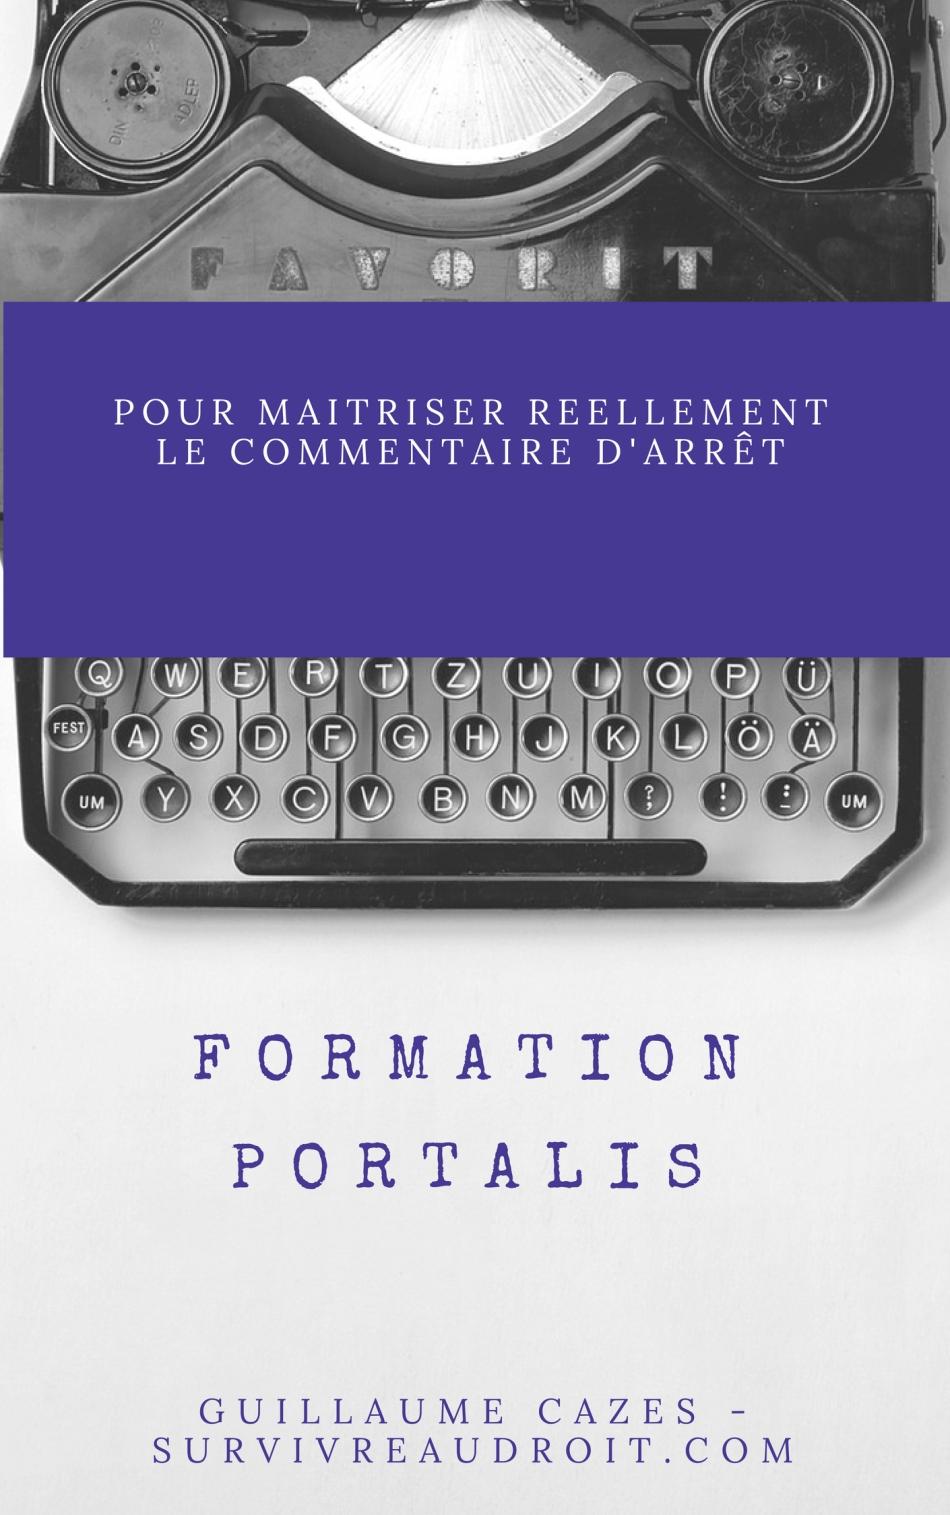 Formation portalis (2)